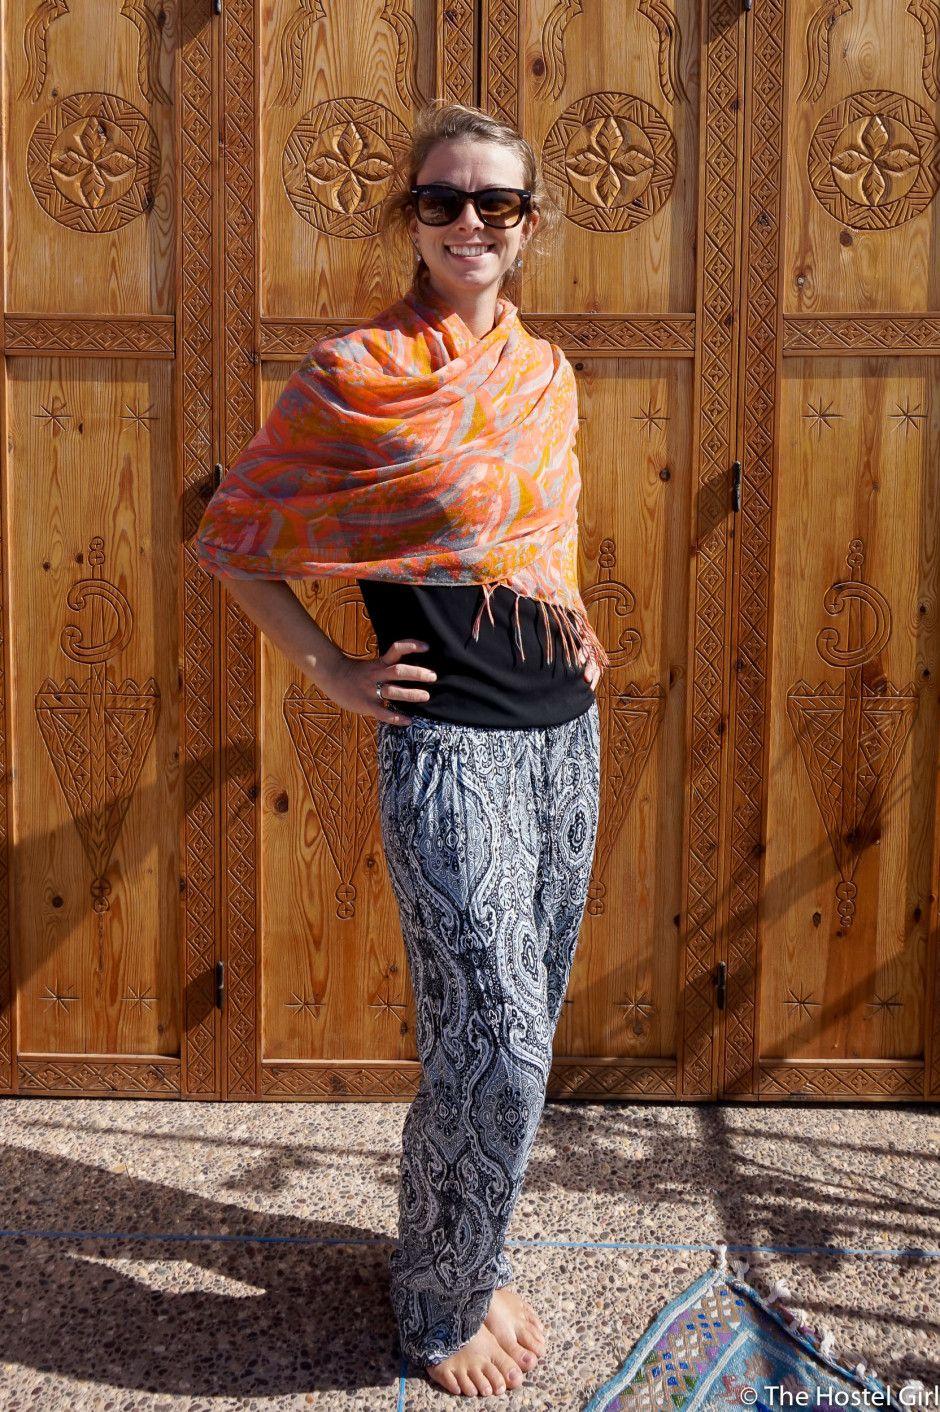 Dress code egypt - How To Dress In Morocco Morocc Dress Code The Hostel Girl 3